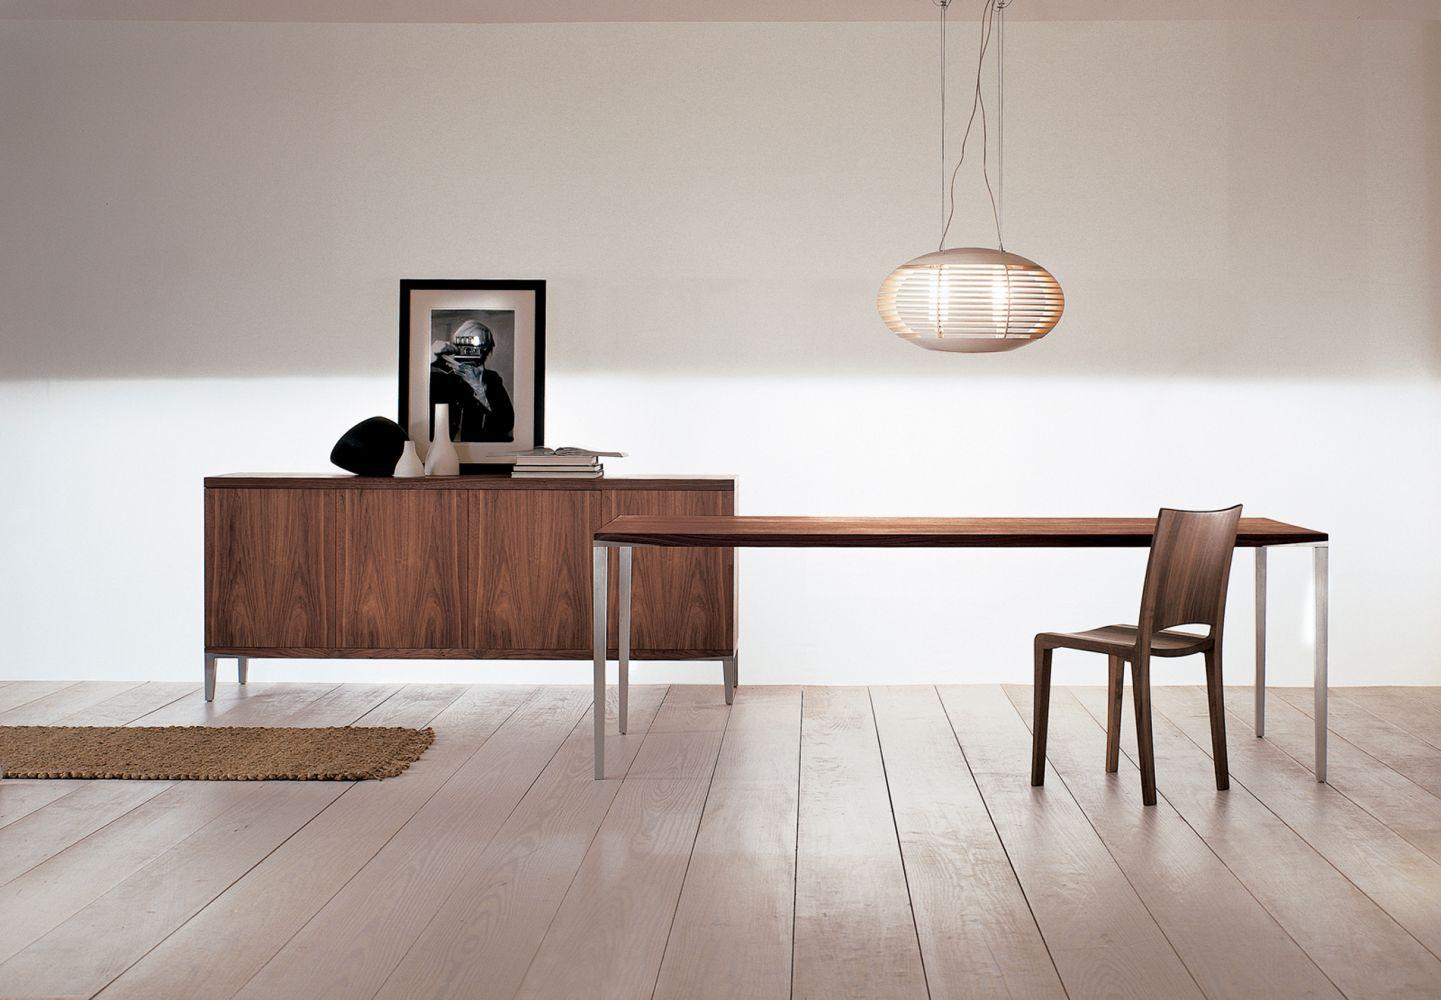 ... Moderner Tisch / Massivholz / Aluminium / Rechteckig ALFREDO Riva  Industria Mobili